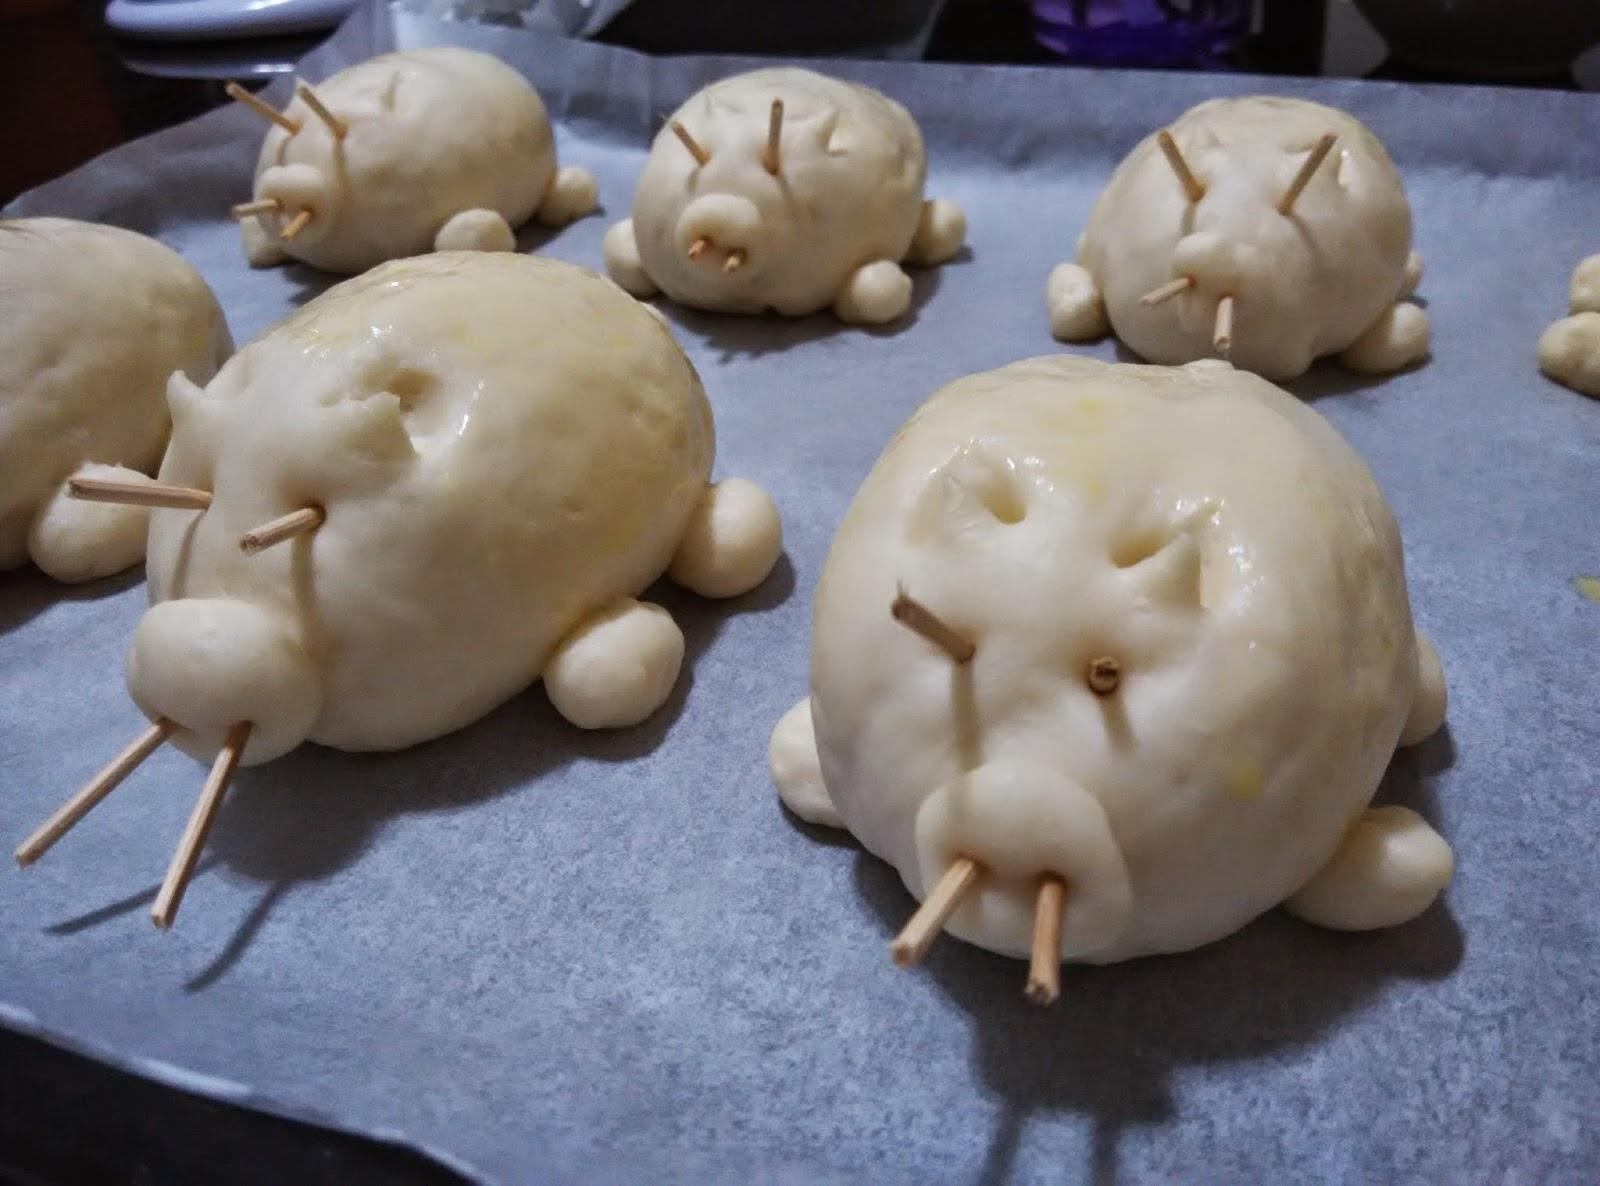 piglet-bread-bun